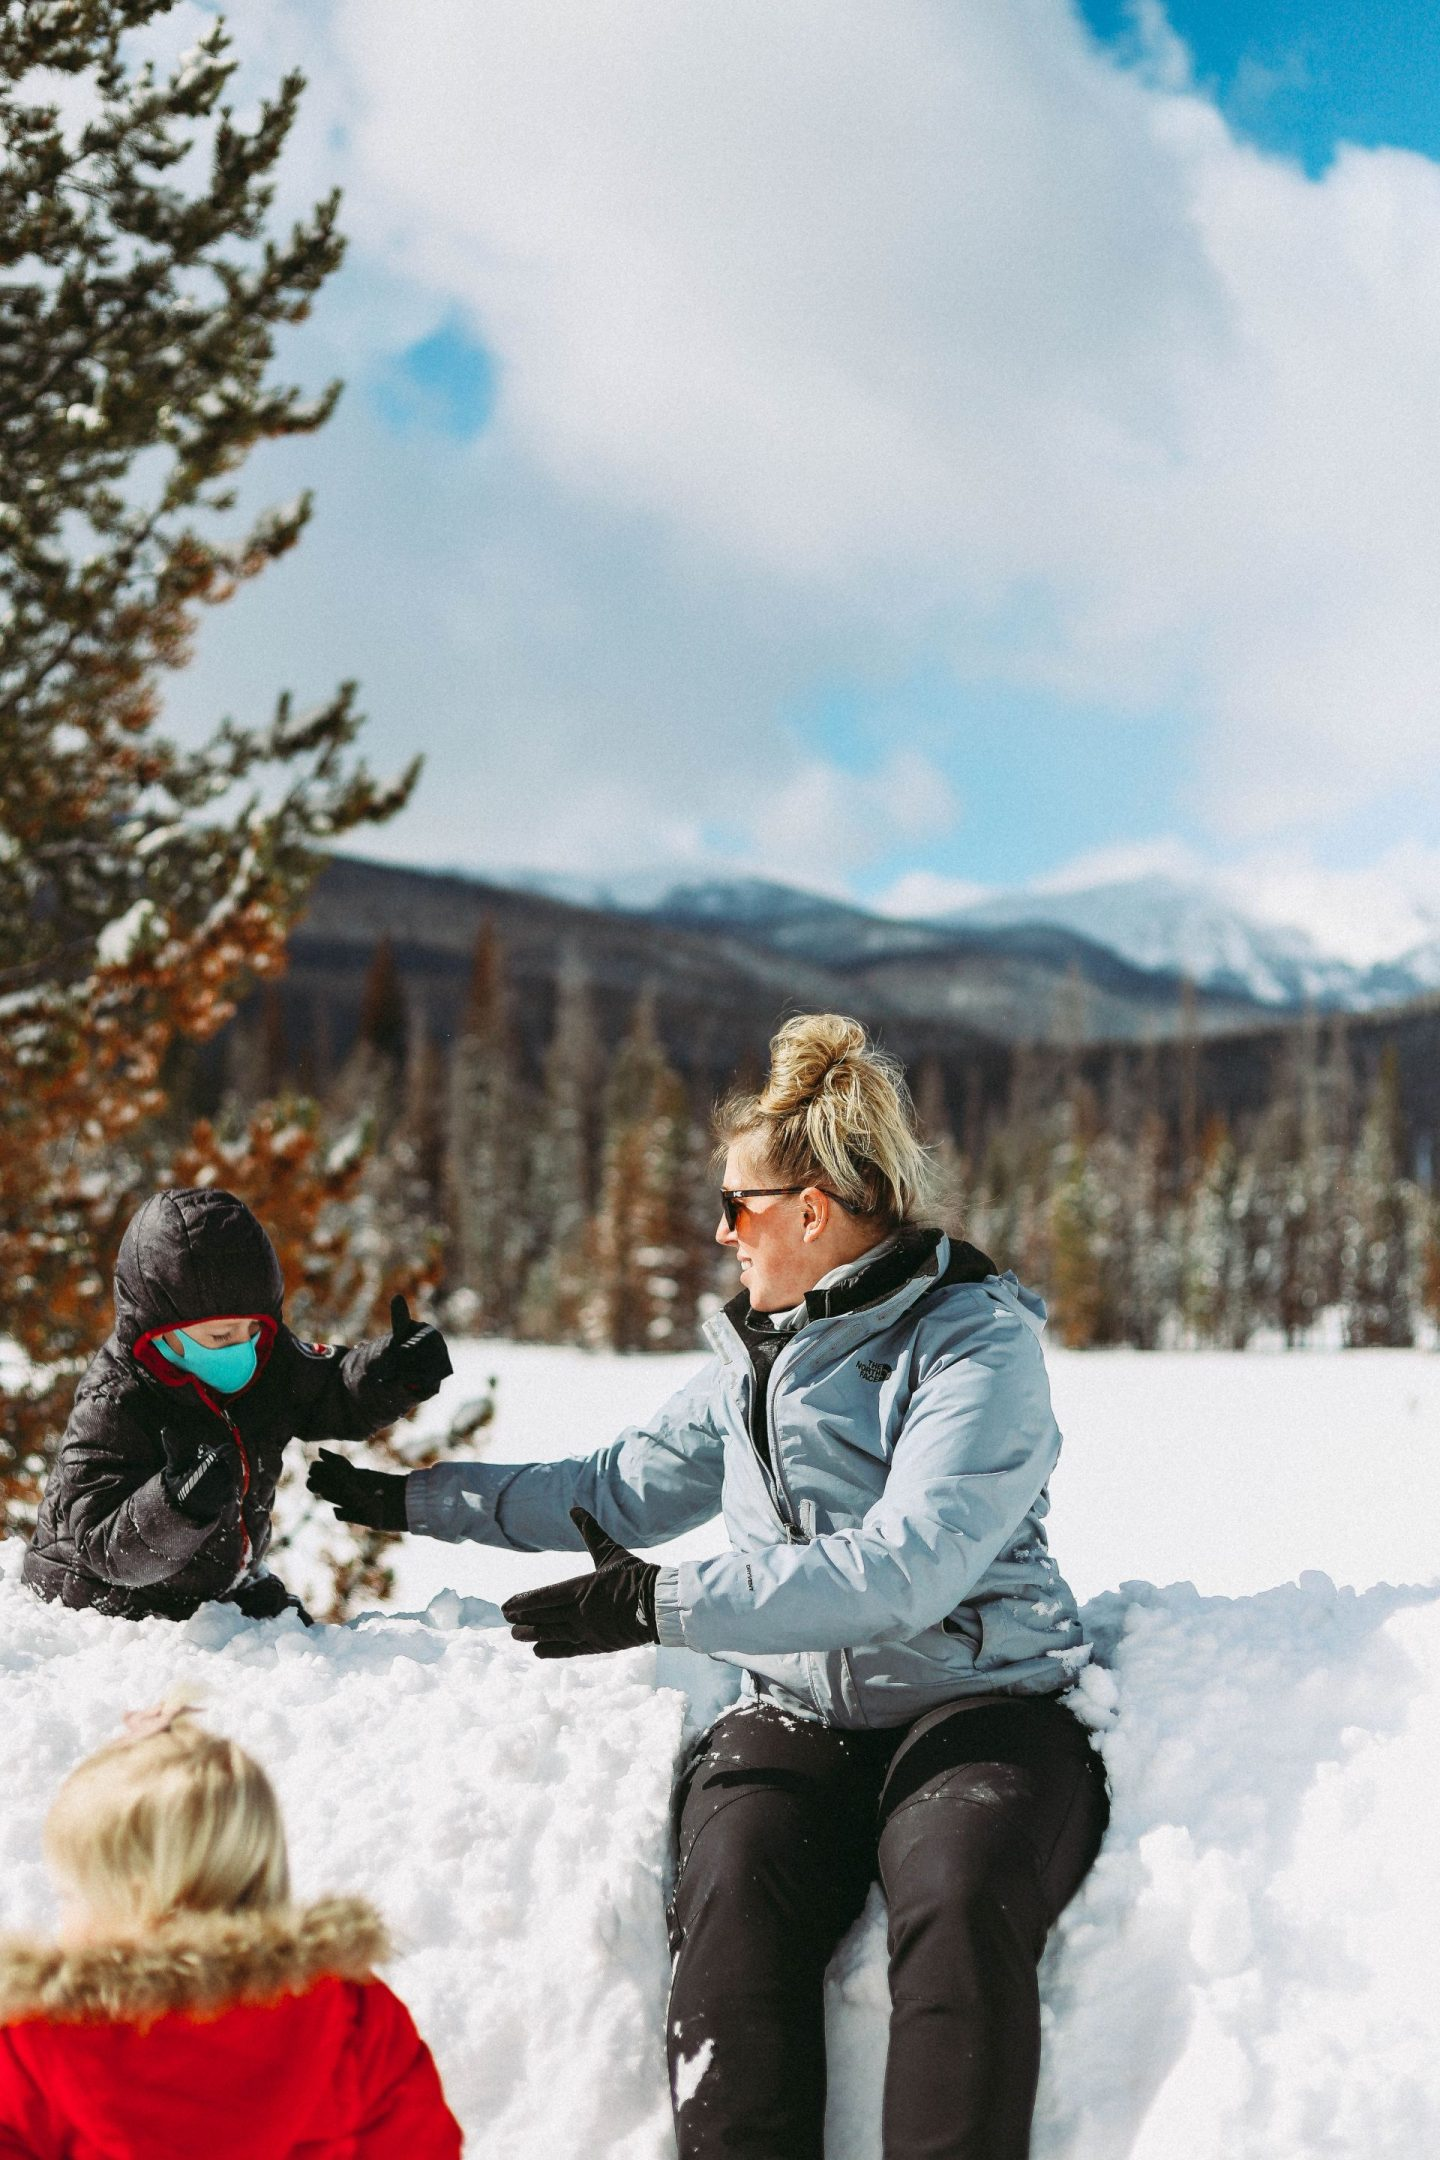 snow play rocky mountain national park